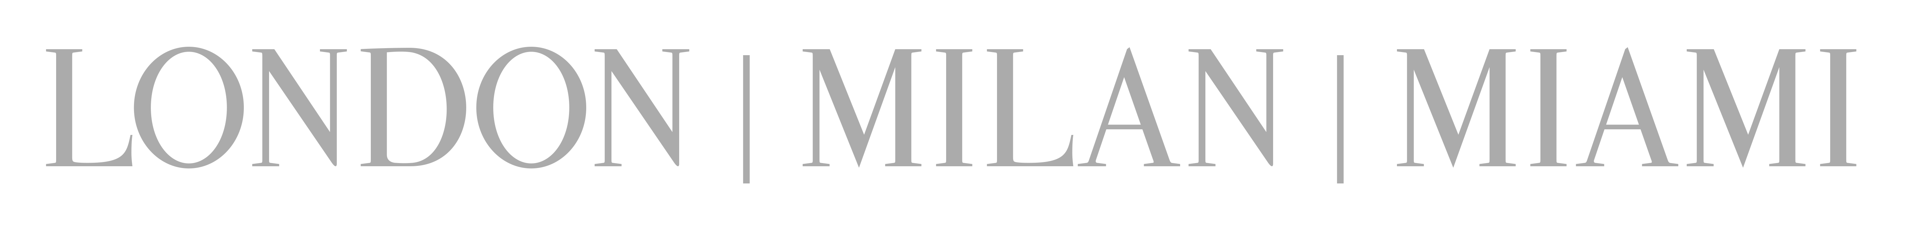 london_milan_miami